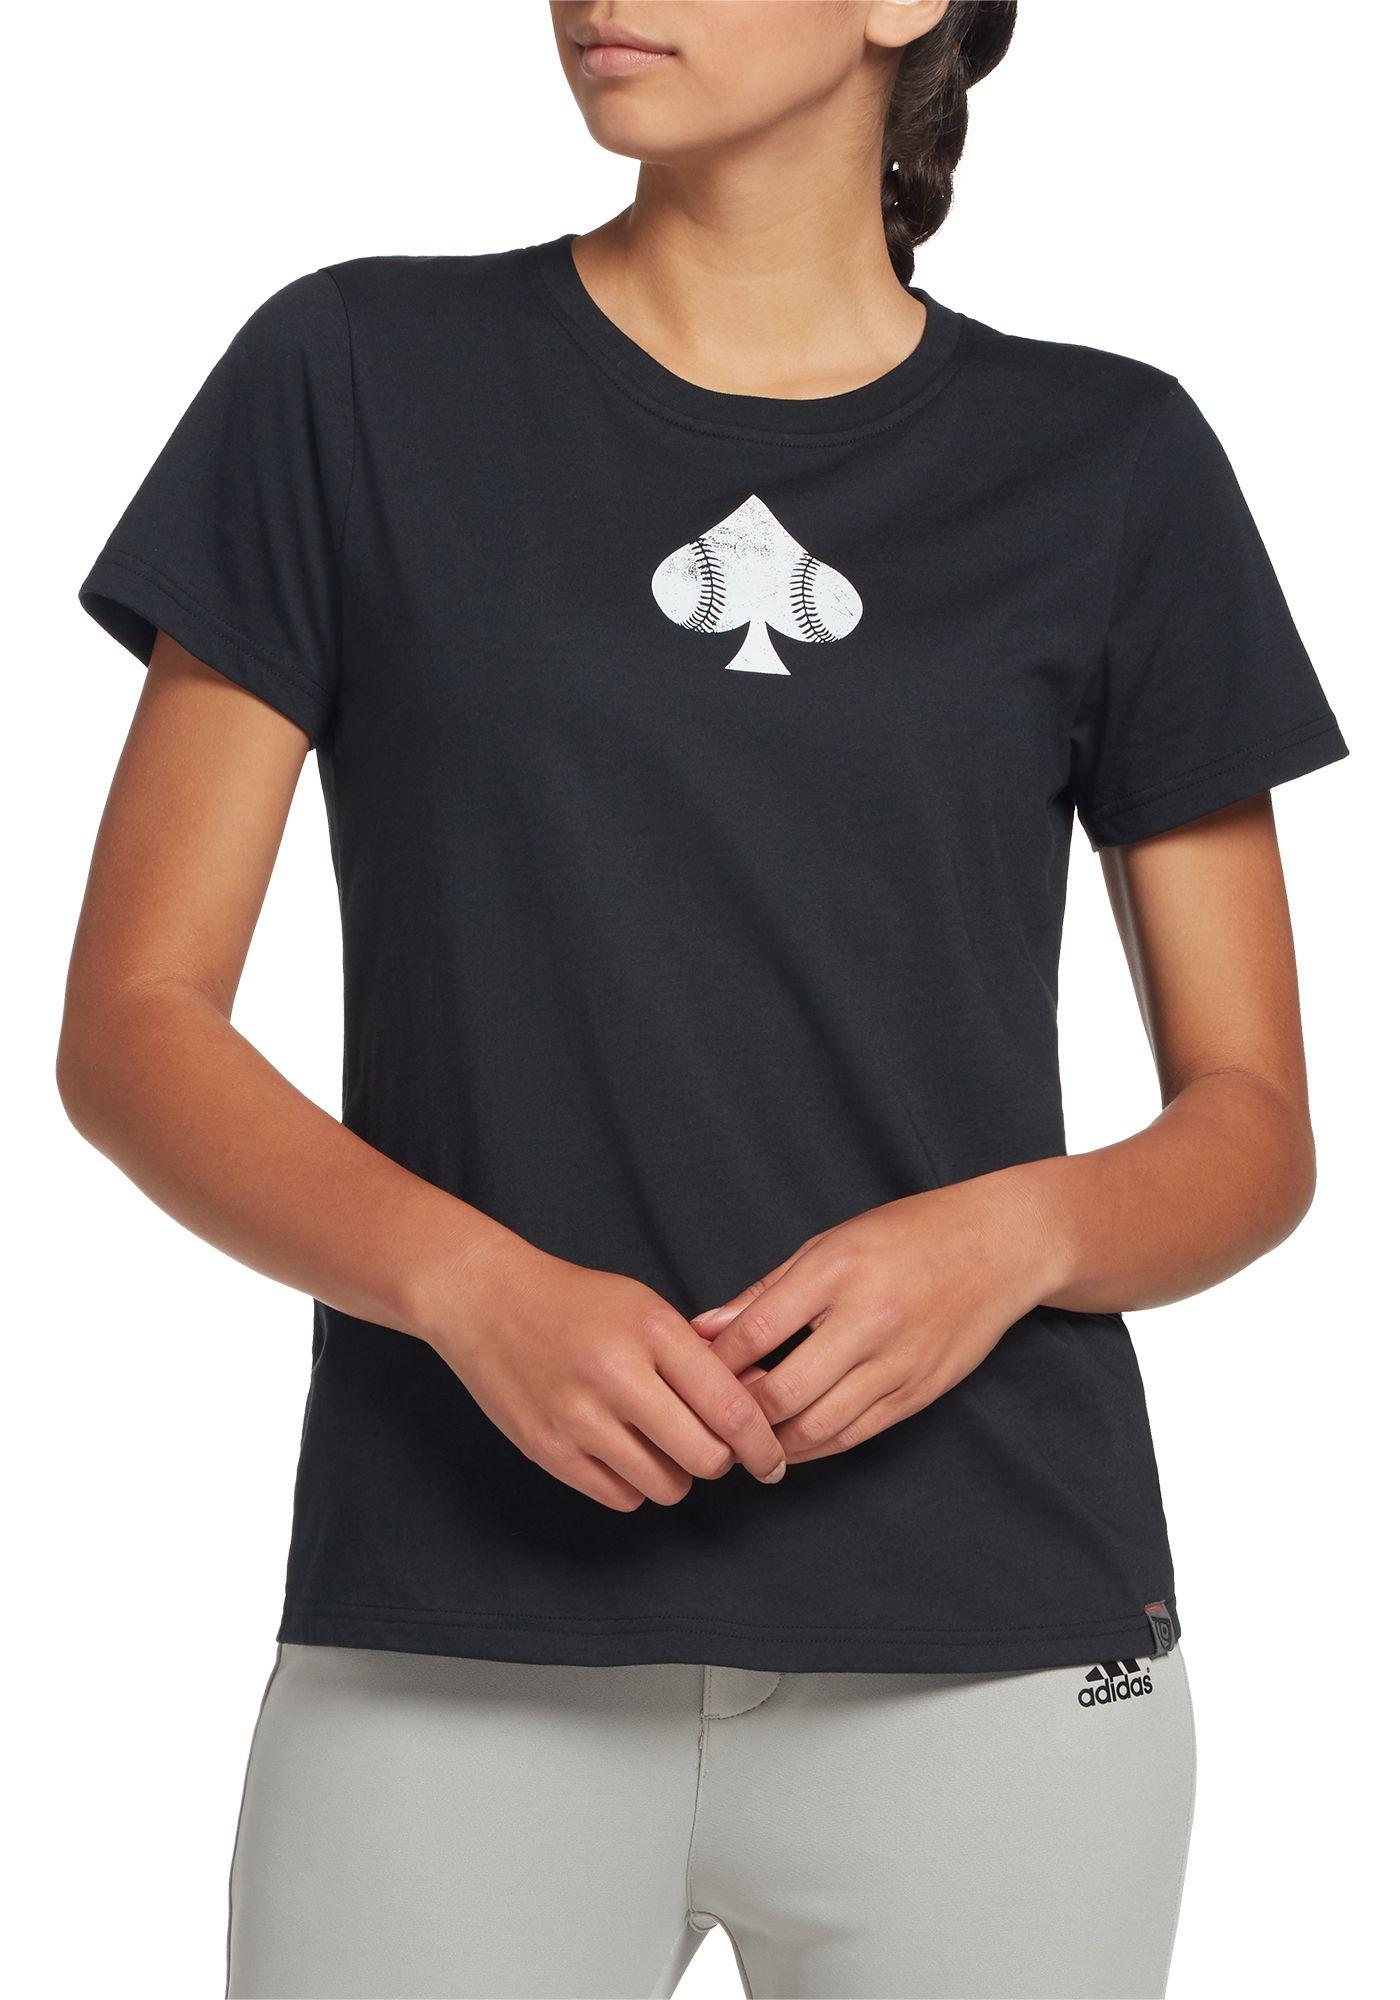 DICK'S Sporting Goods Women's Ball Park Series Softball Graphic T-Shirt